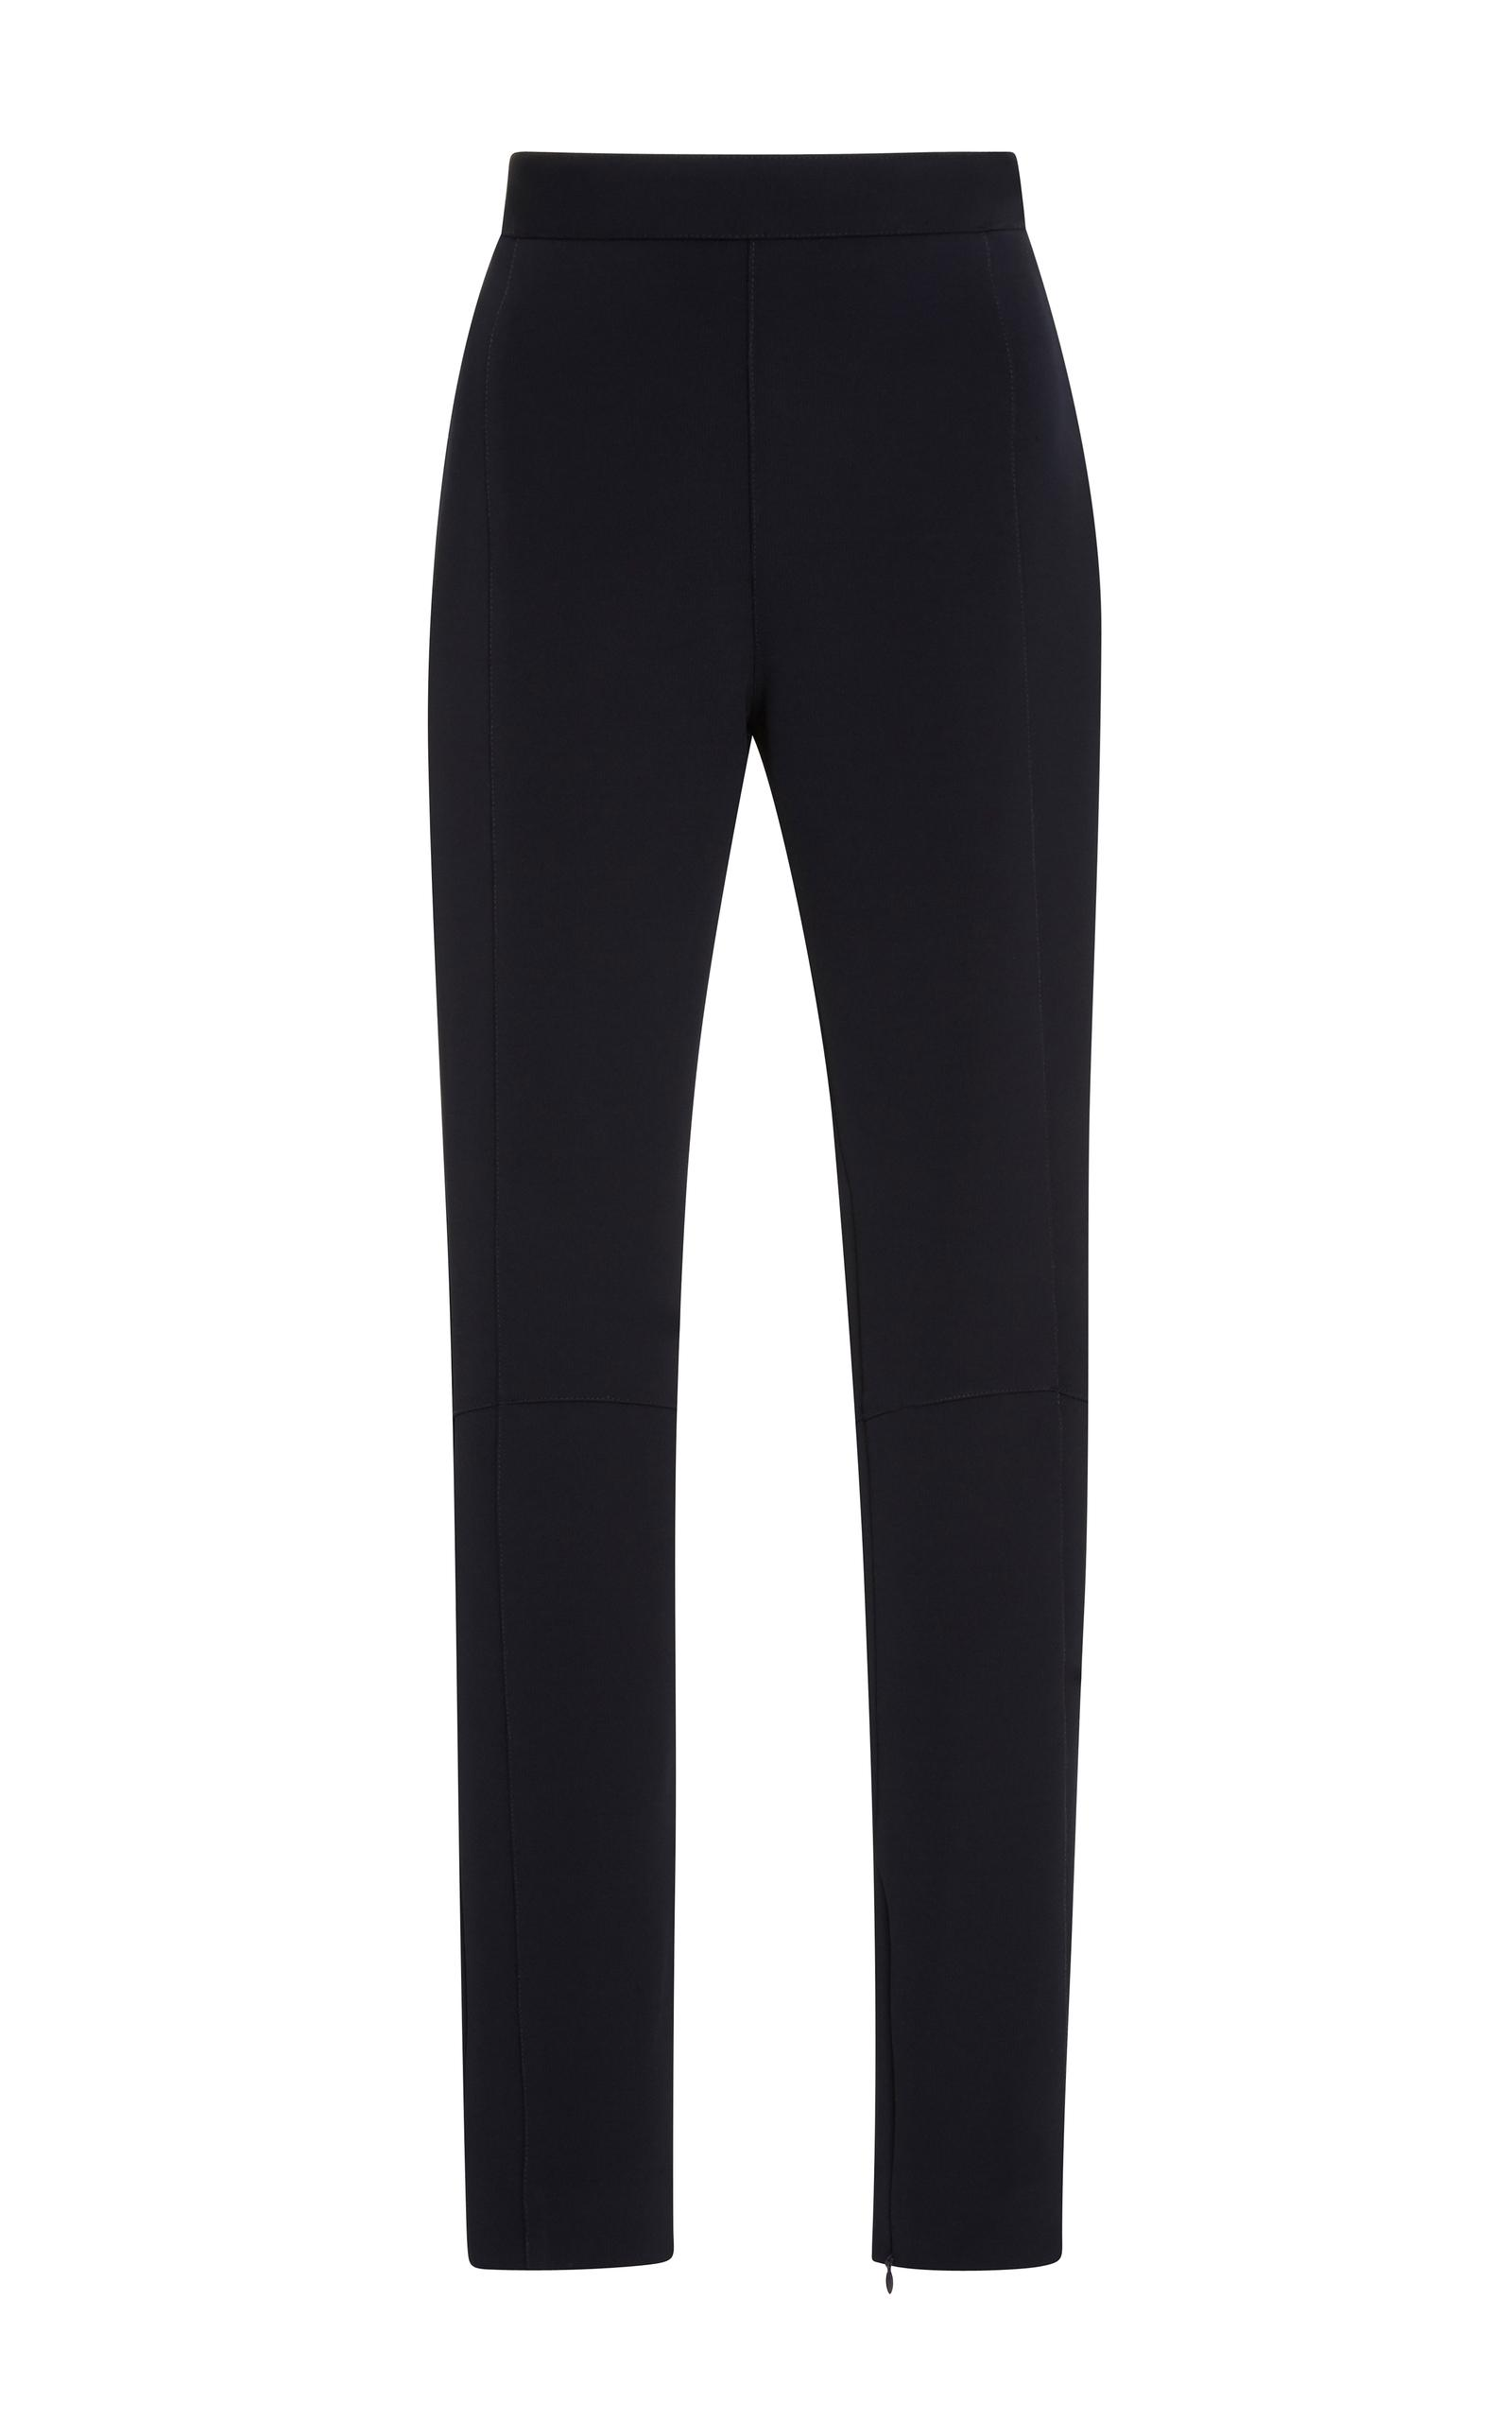 Jonathan Simkhai Bodycon Elastania Skin Fit Pants In Black